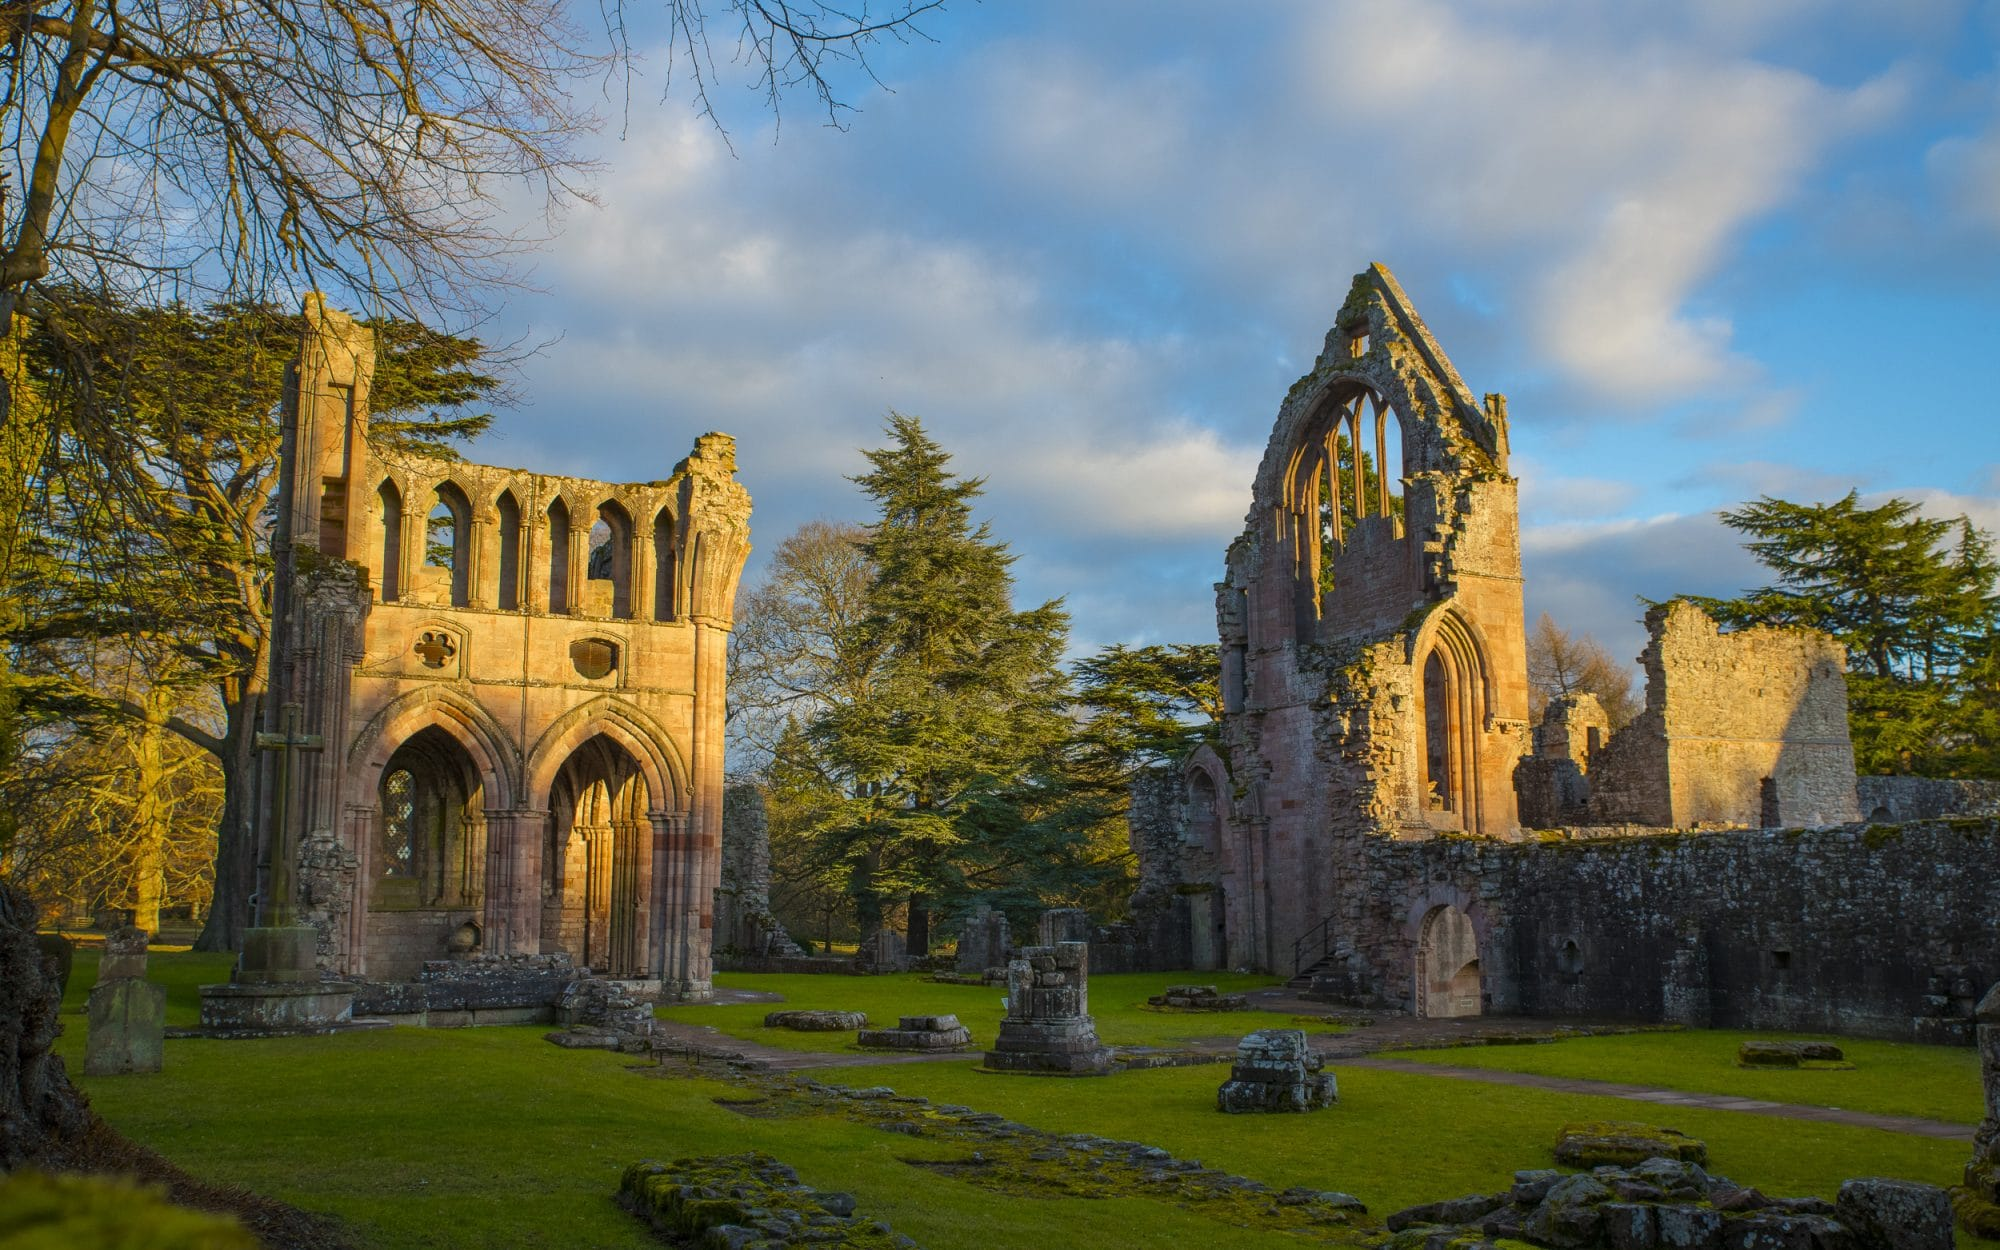 dryburgh-abbey-the-peaceful-sir-edwards-roadtrip